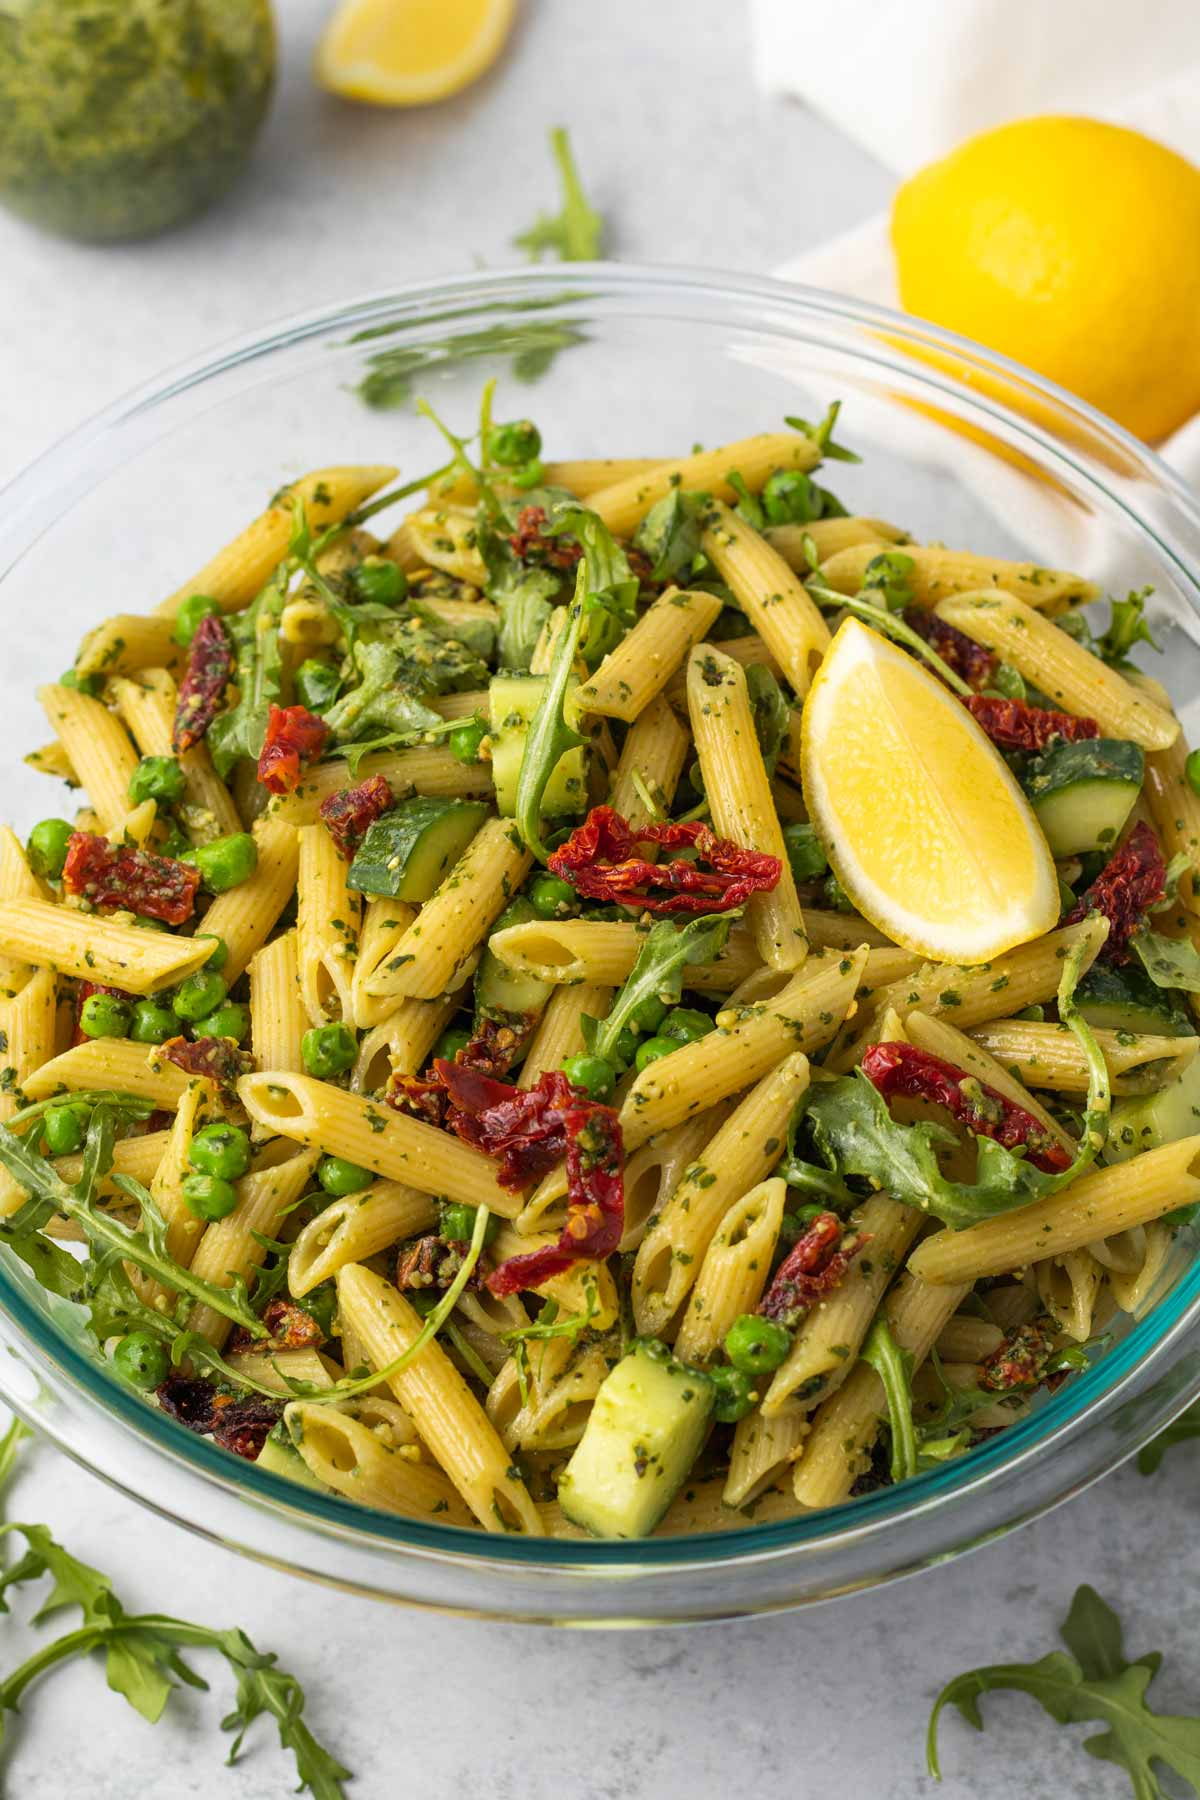 Large bowl of pesto pasta salad, garnished with a lemon slice.